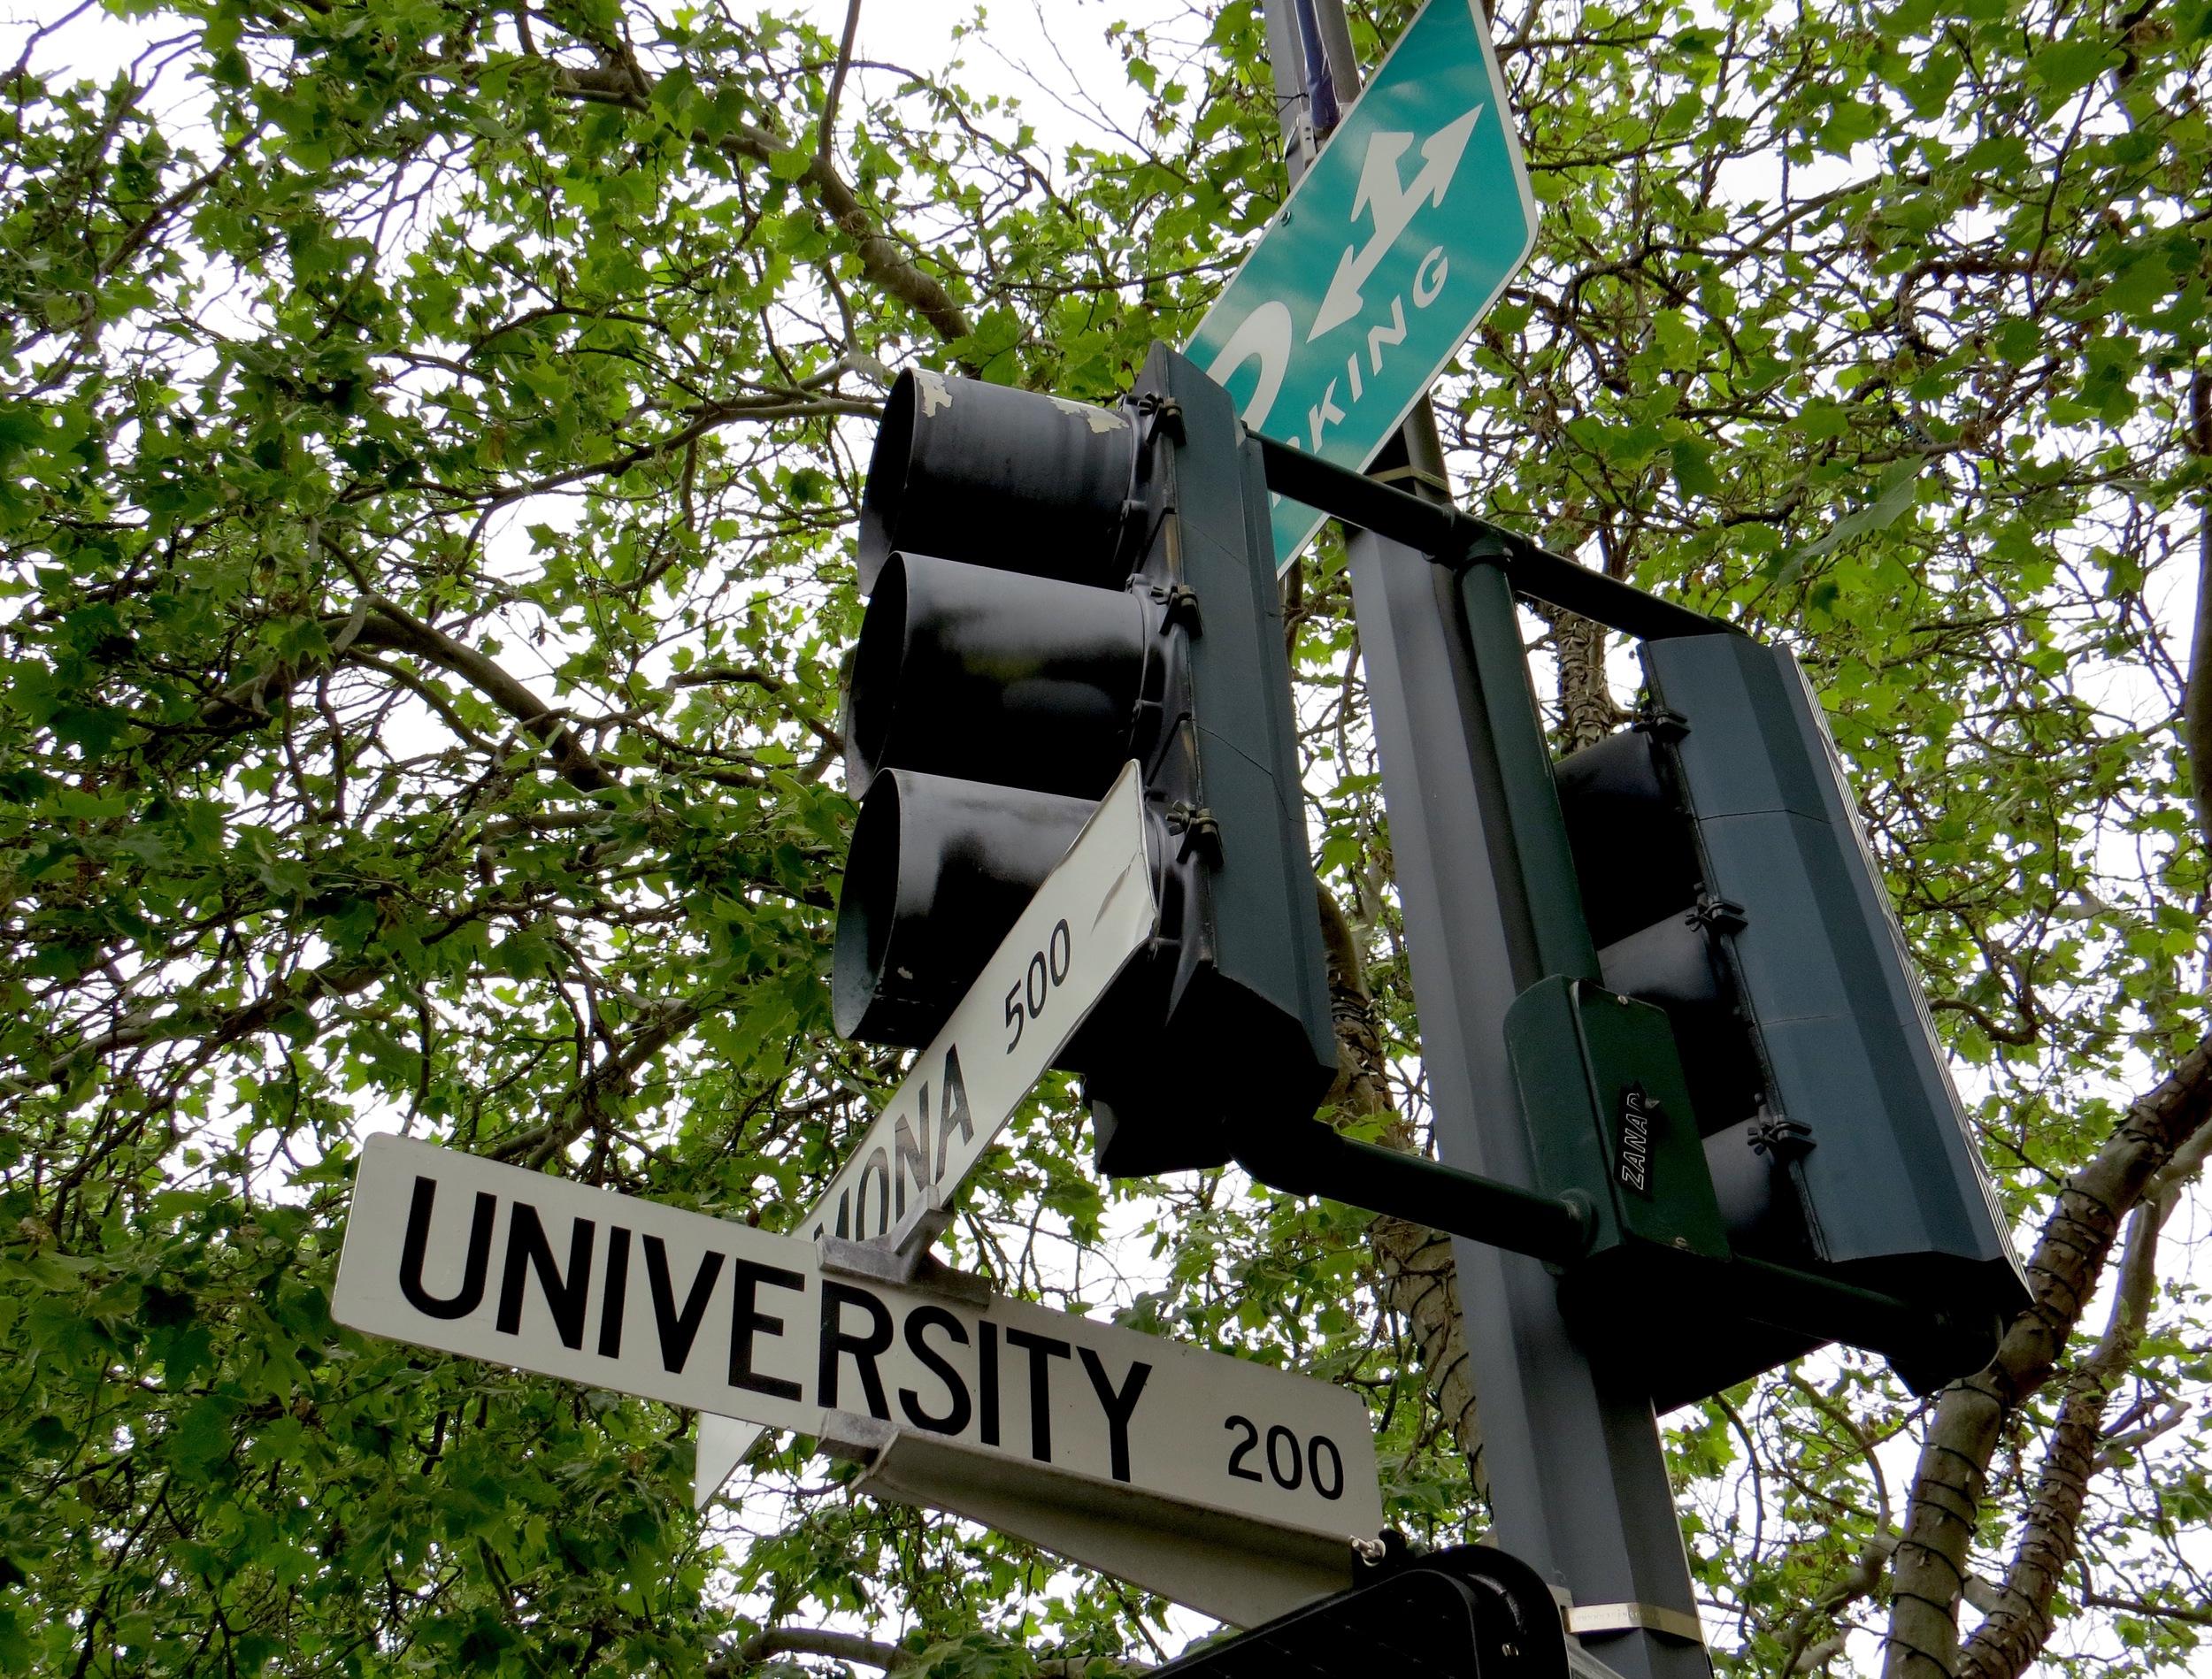 universitysign.jpg